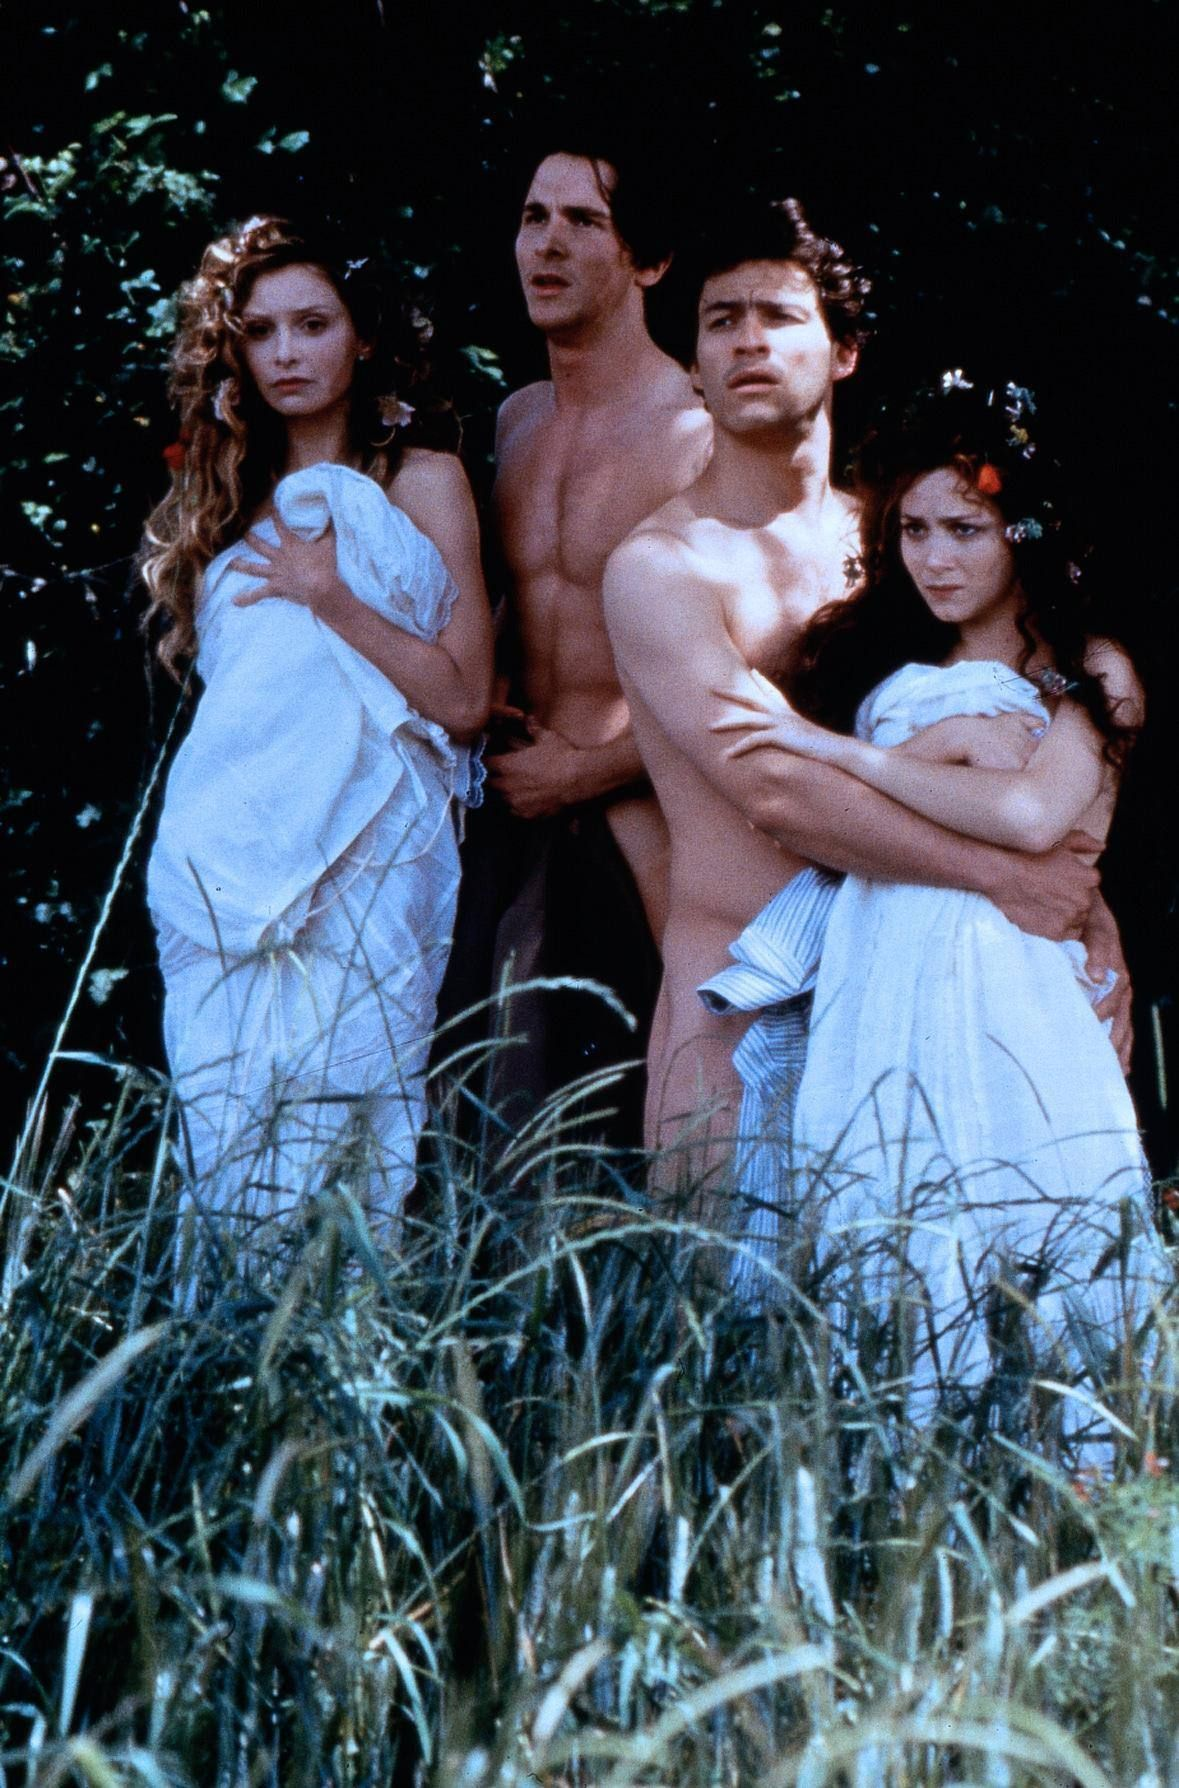 Christian Bale, Dominic West, Calista Flockhart, Anna Friel.. A Midsummer Night's Dream.. love this movie (flowers in their hair)